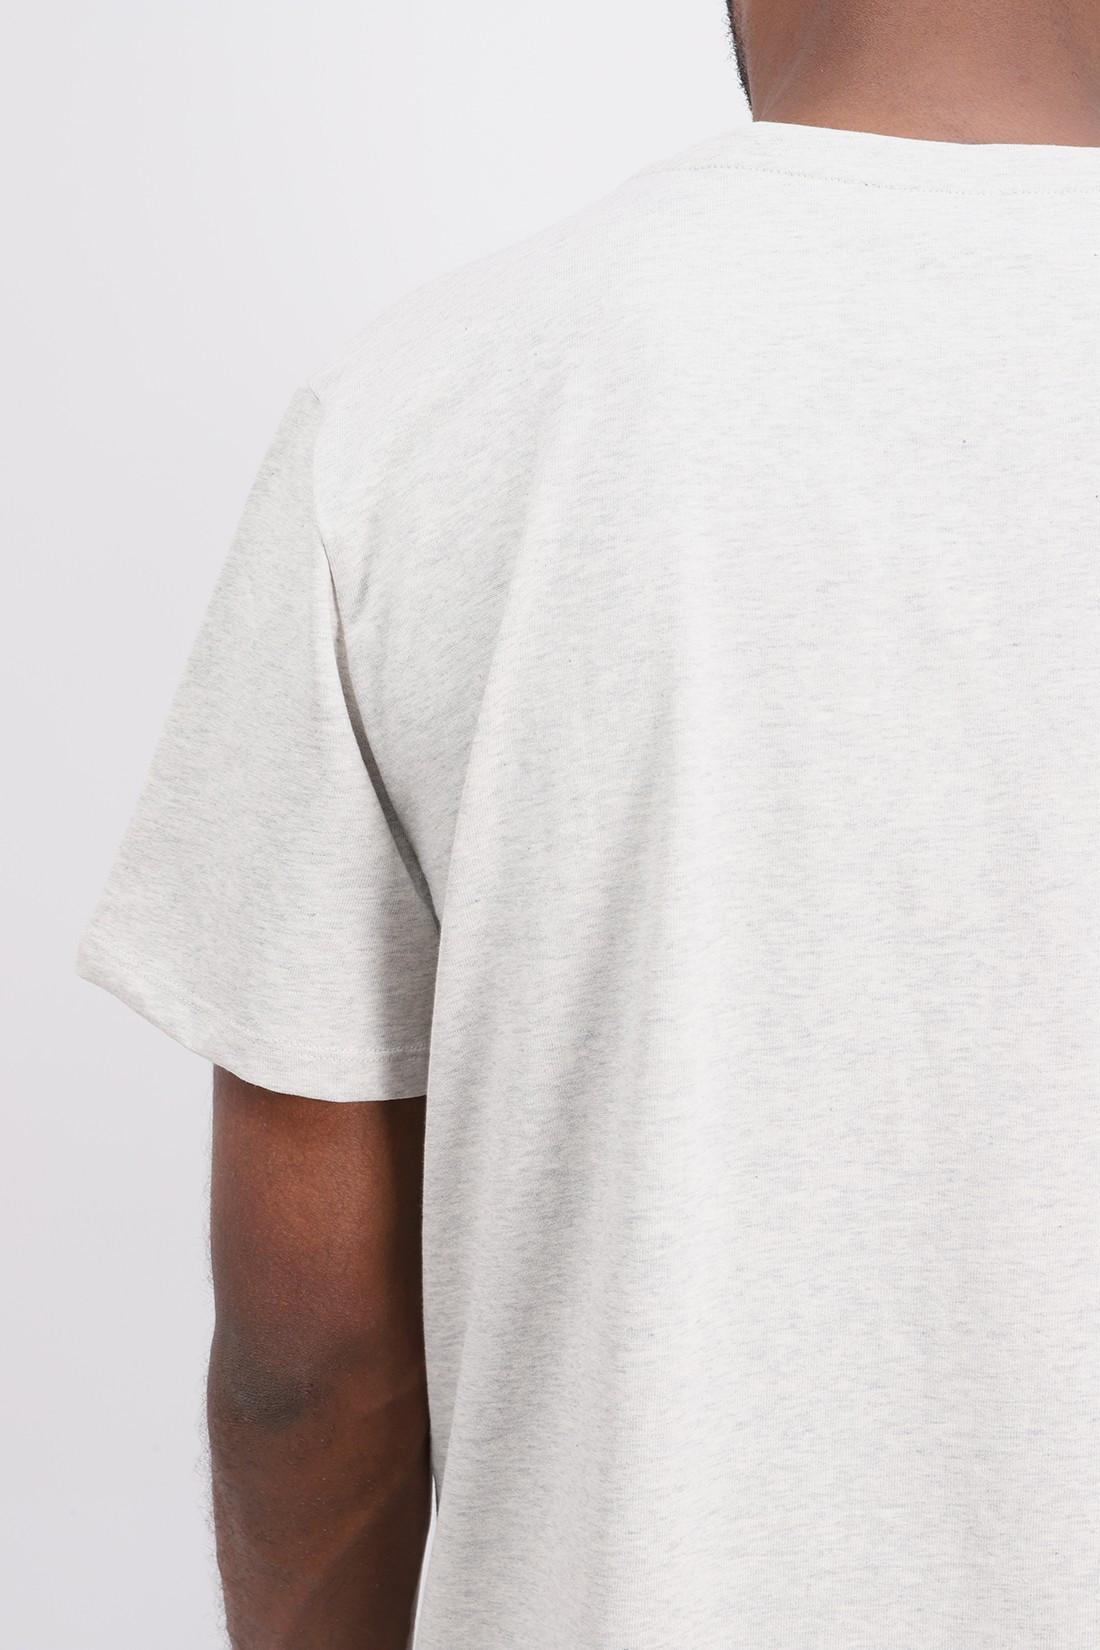 A.P.C. / T-shirt raymond Ecru chine